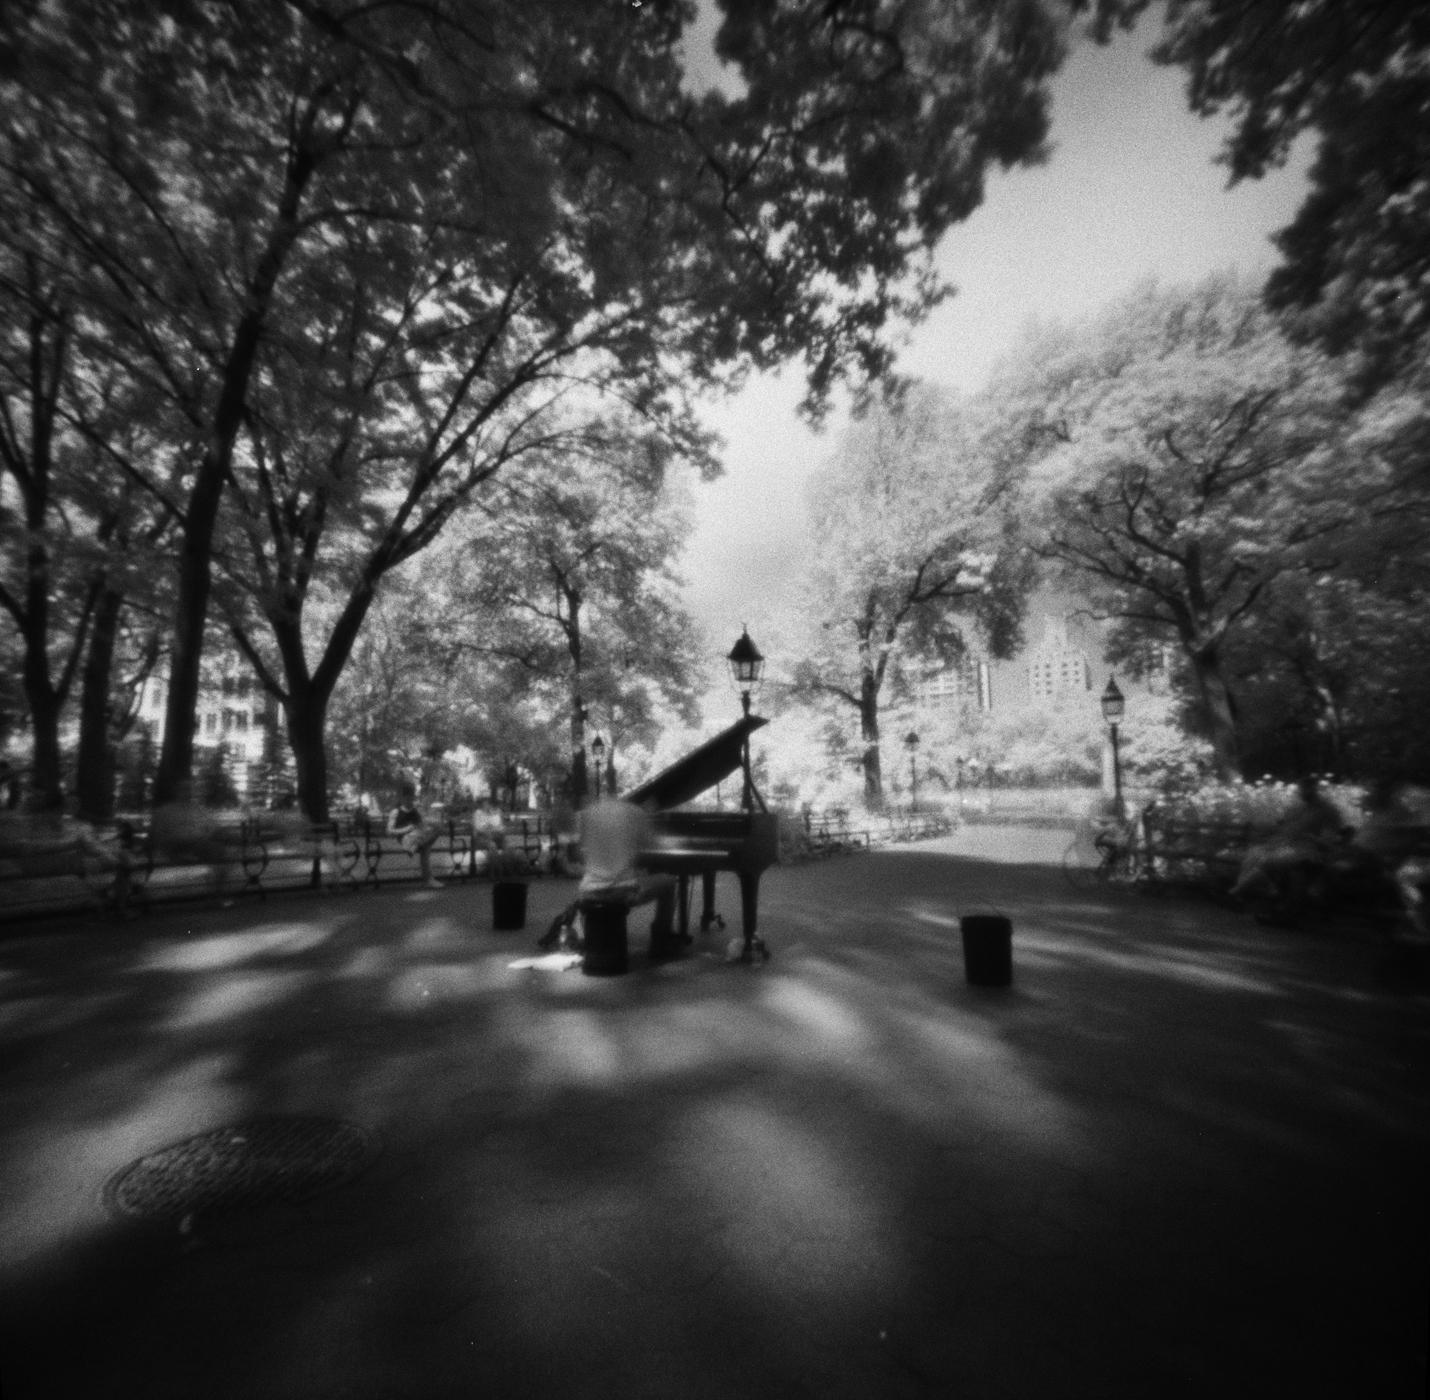 Washington Square Park Piano #1